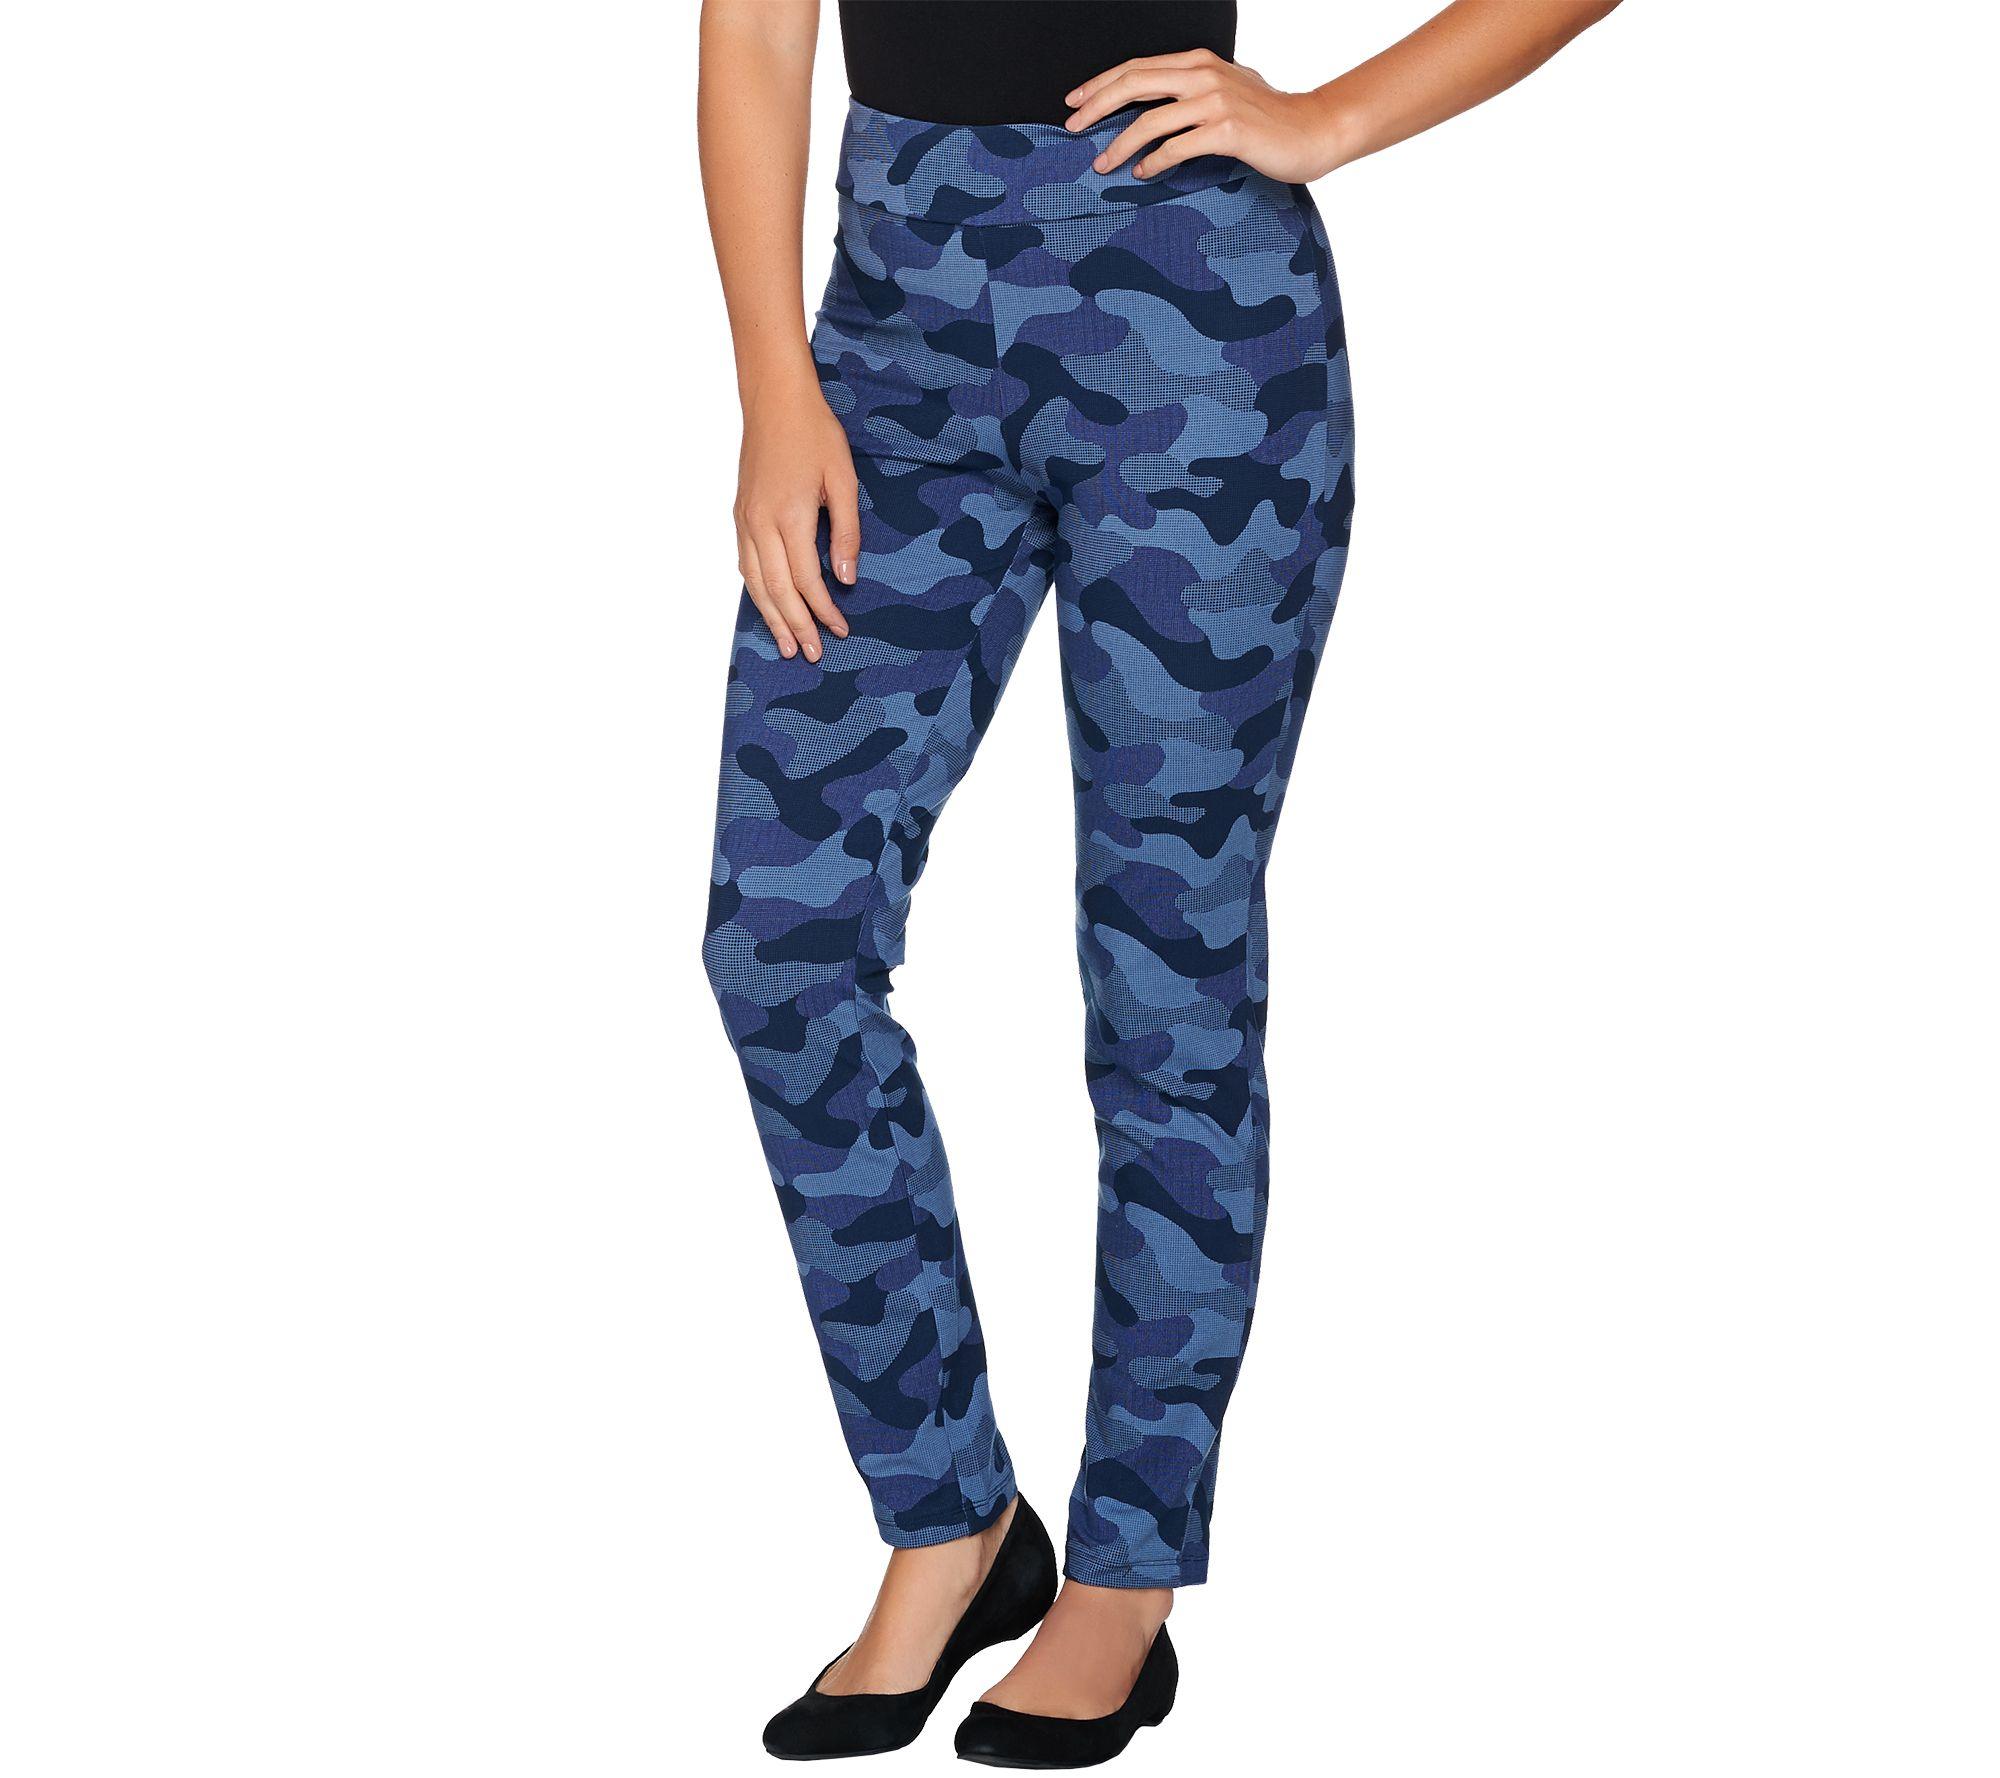 Original Blue Camouflage Military BDU Cargo Bottoms Fatigue Trouser Camo Pants